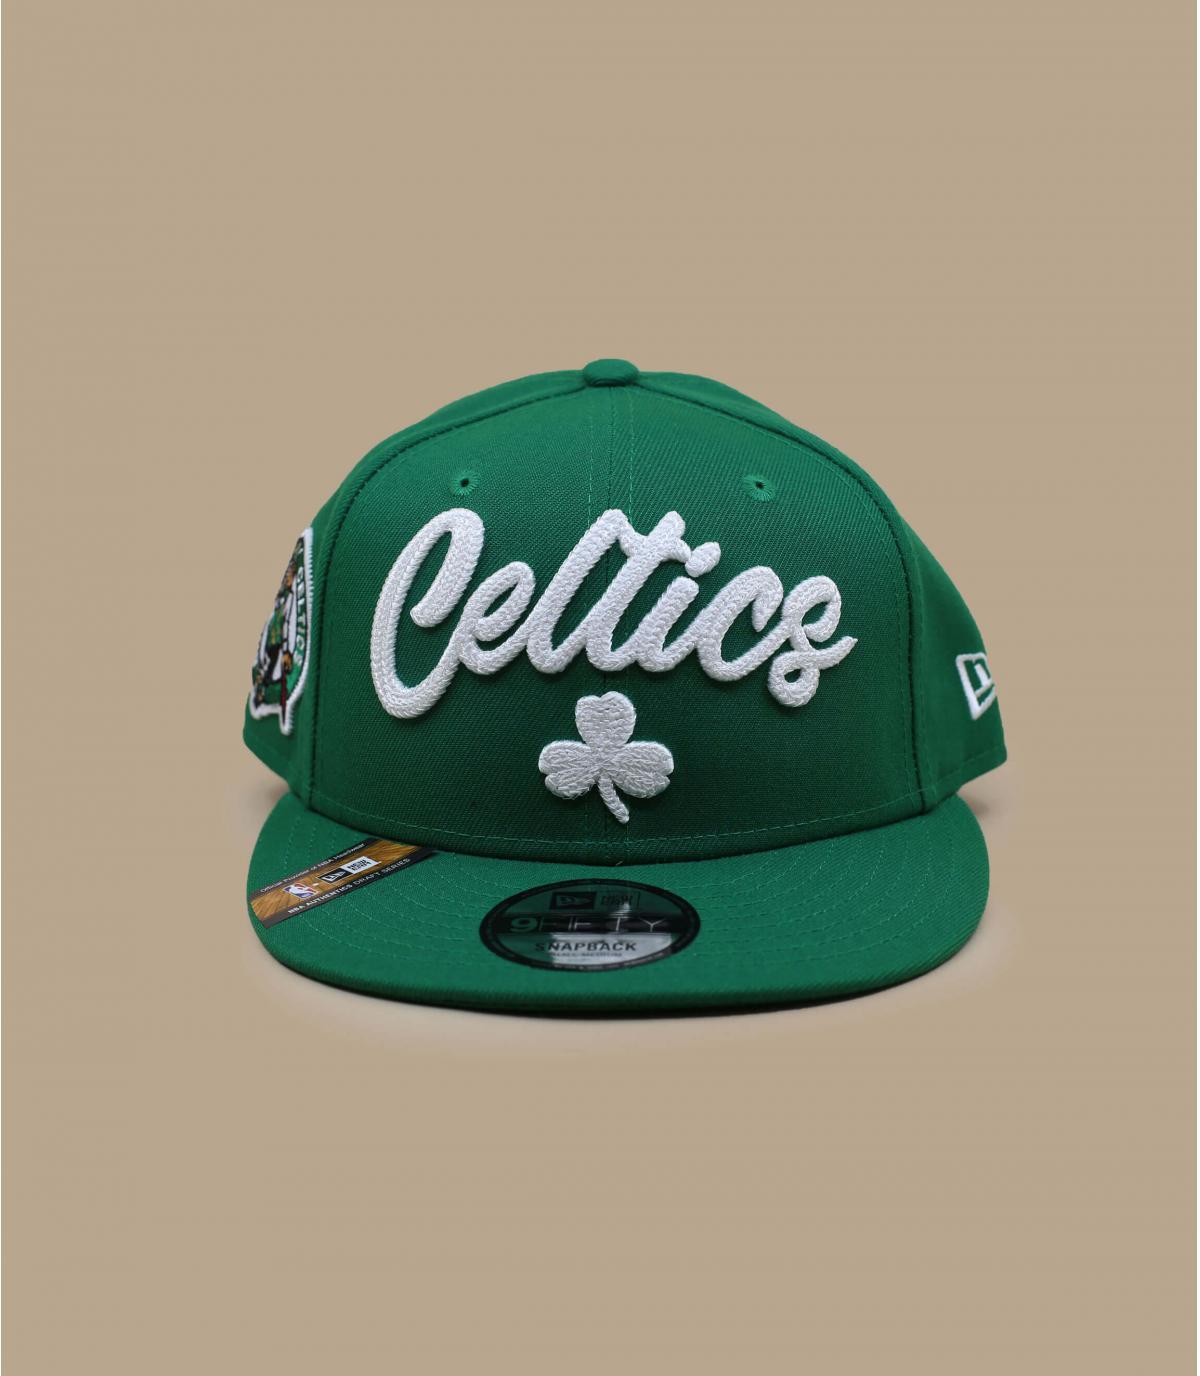 casquette Celtics vert